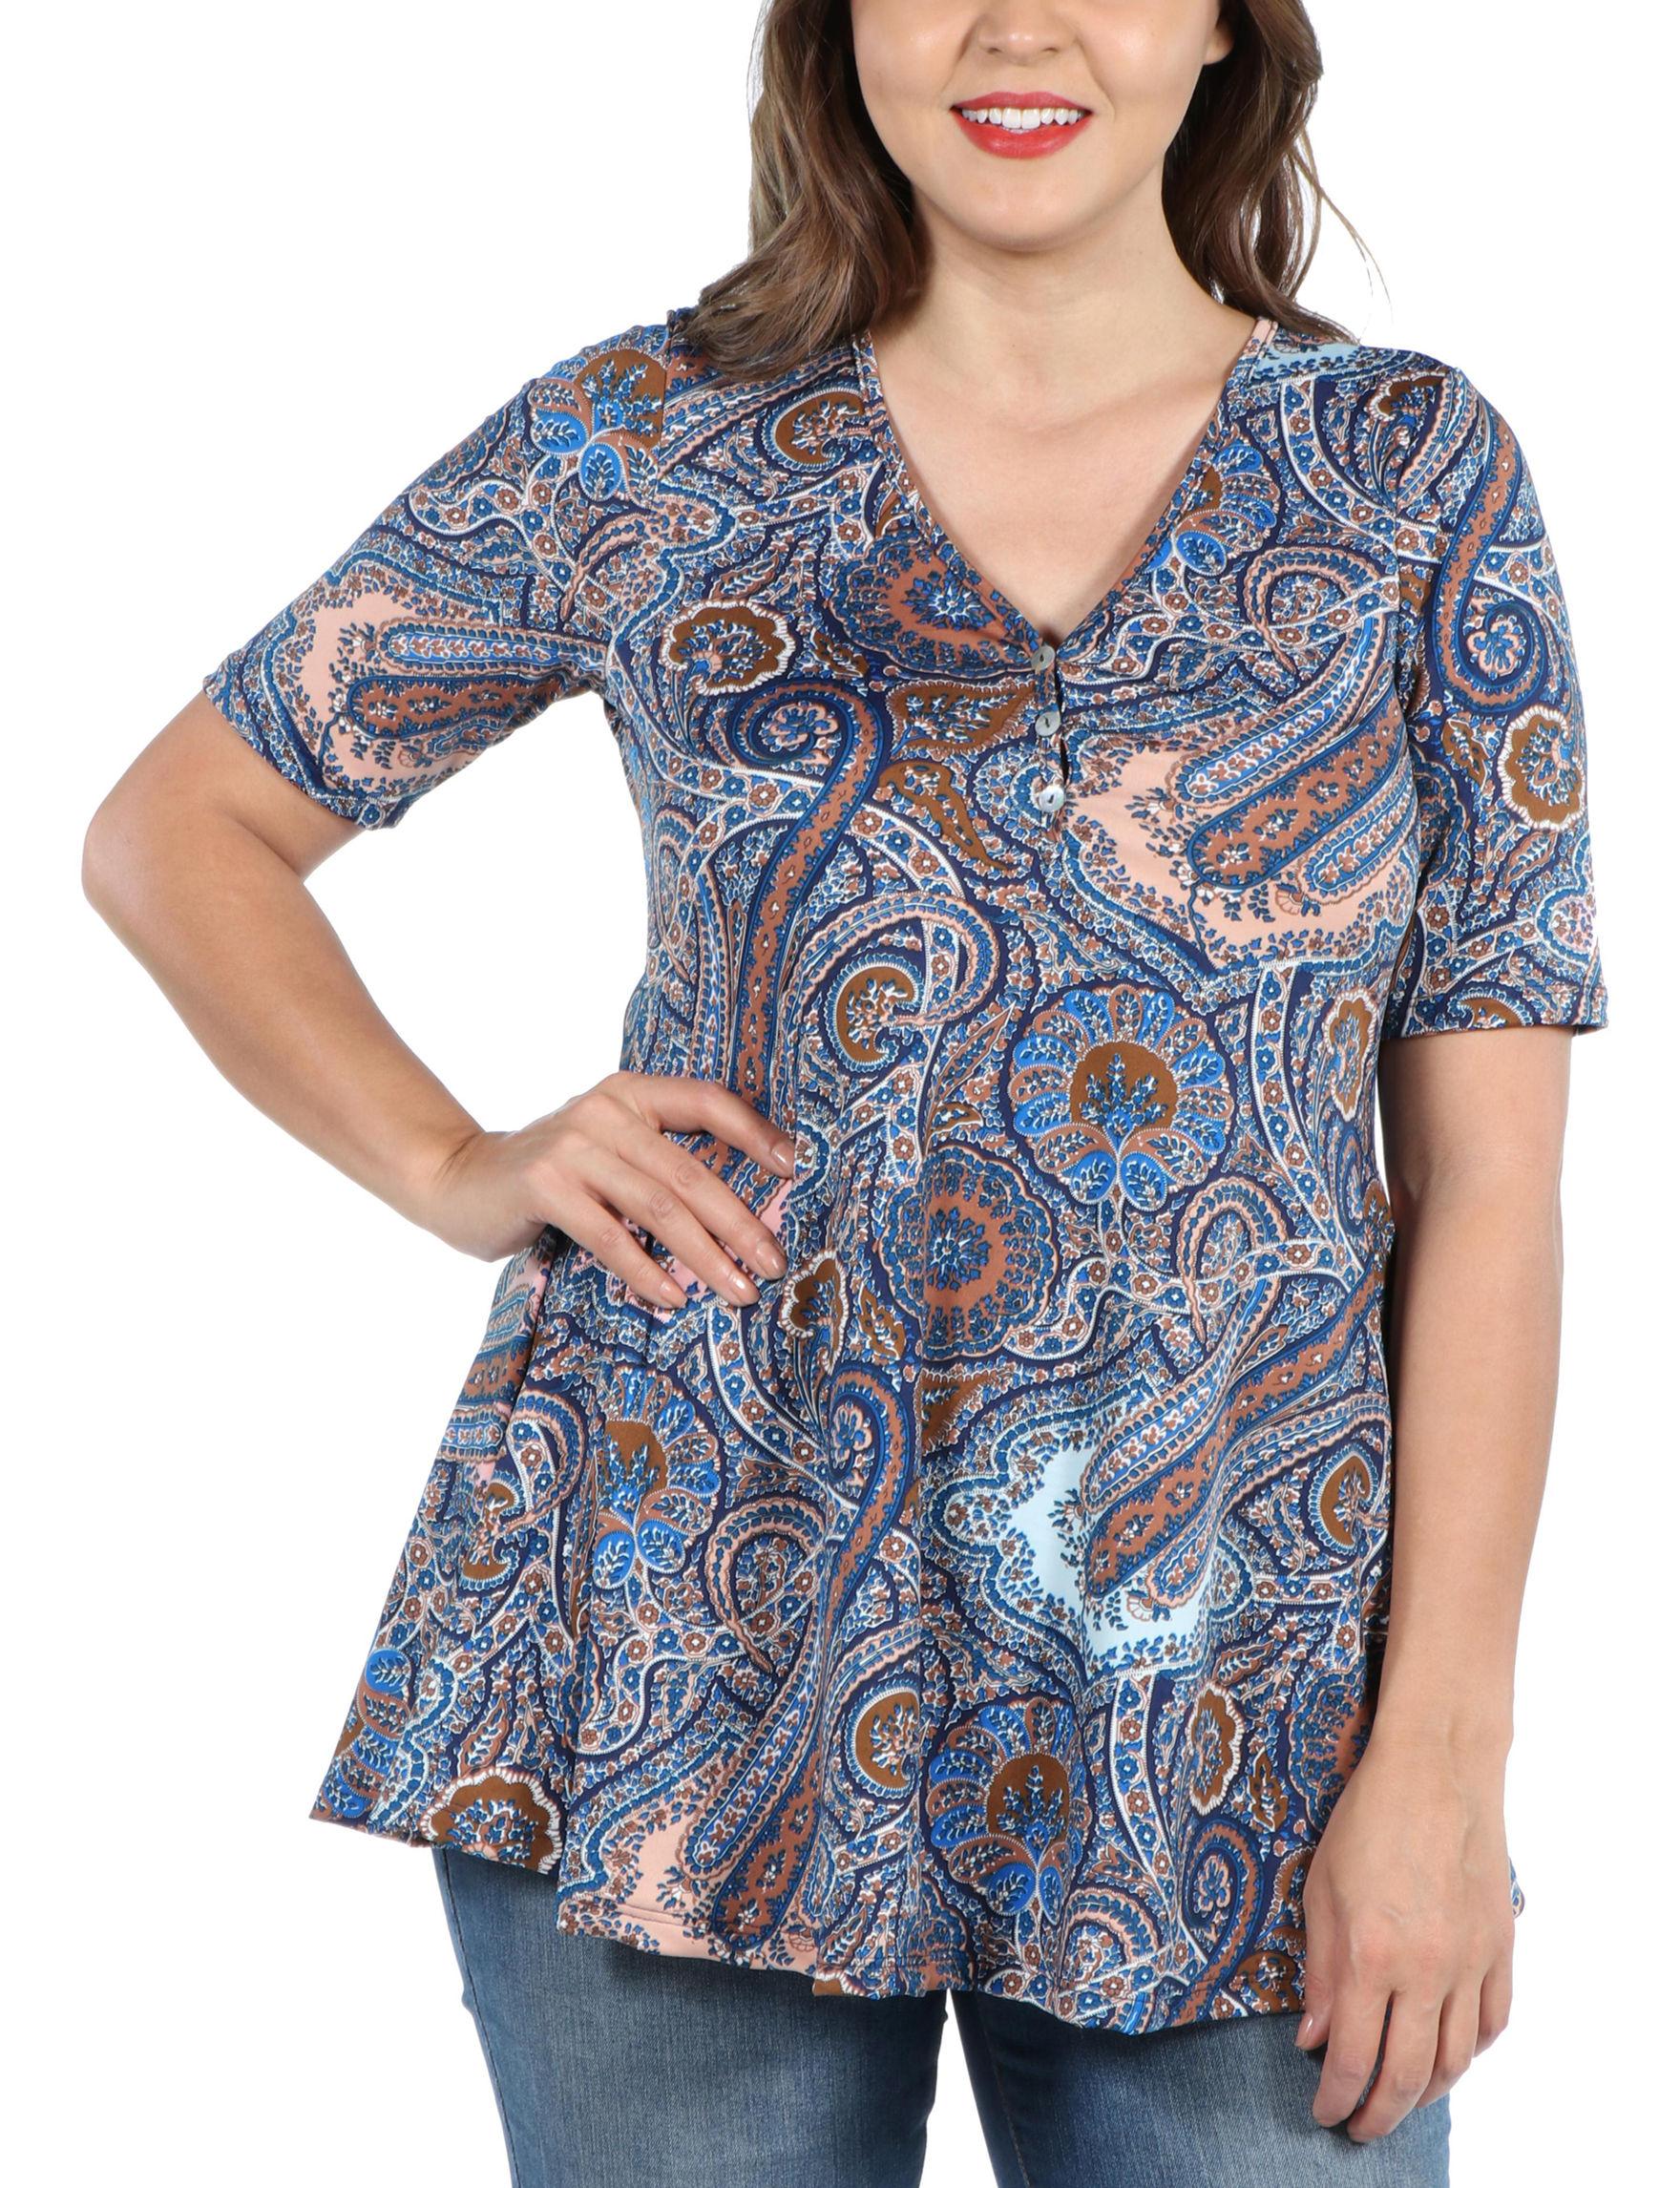 24Seven Comfort Apparel Blue / Multi Tunics